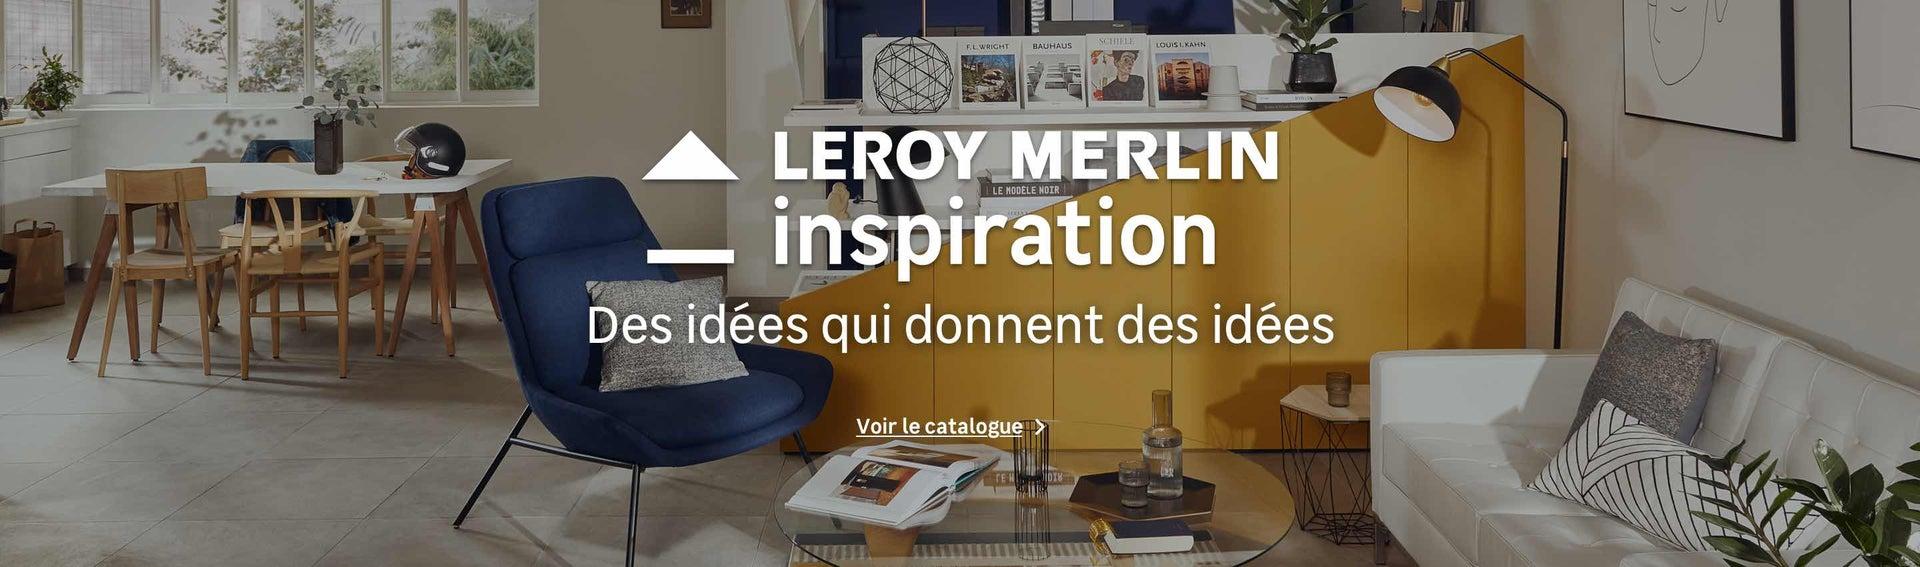 Carrelage sol et carrelage mural | Leroy Merlin